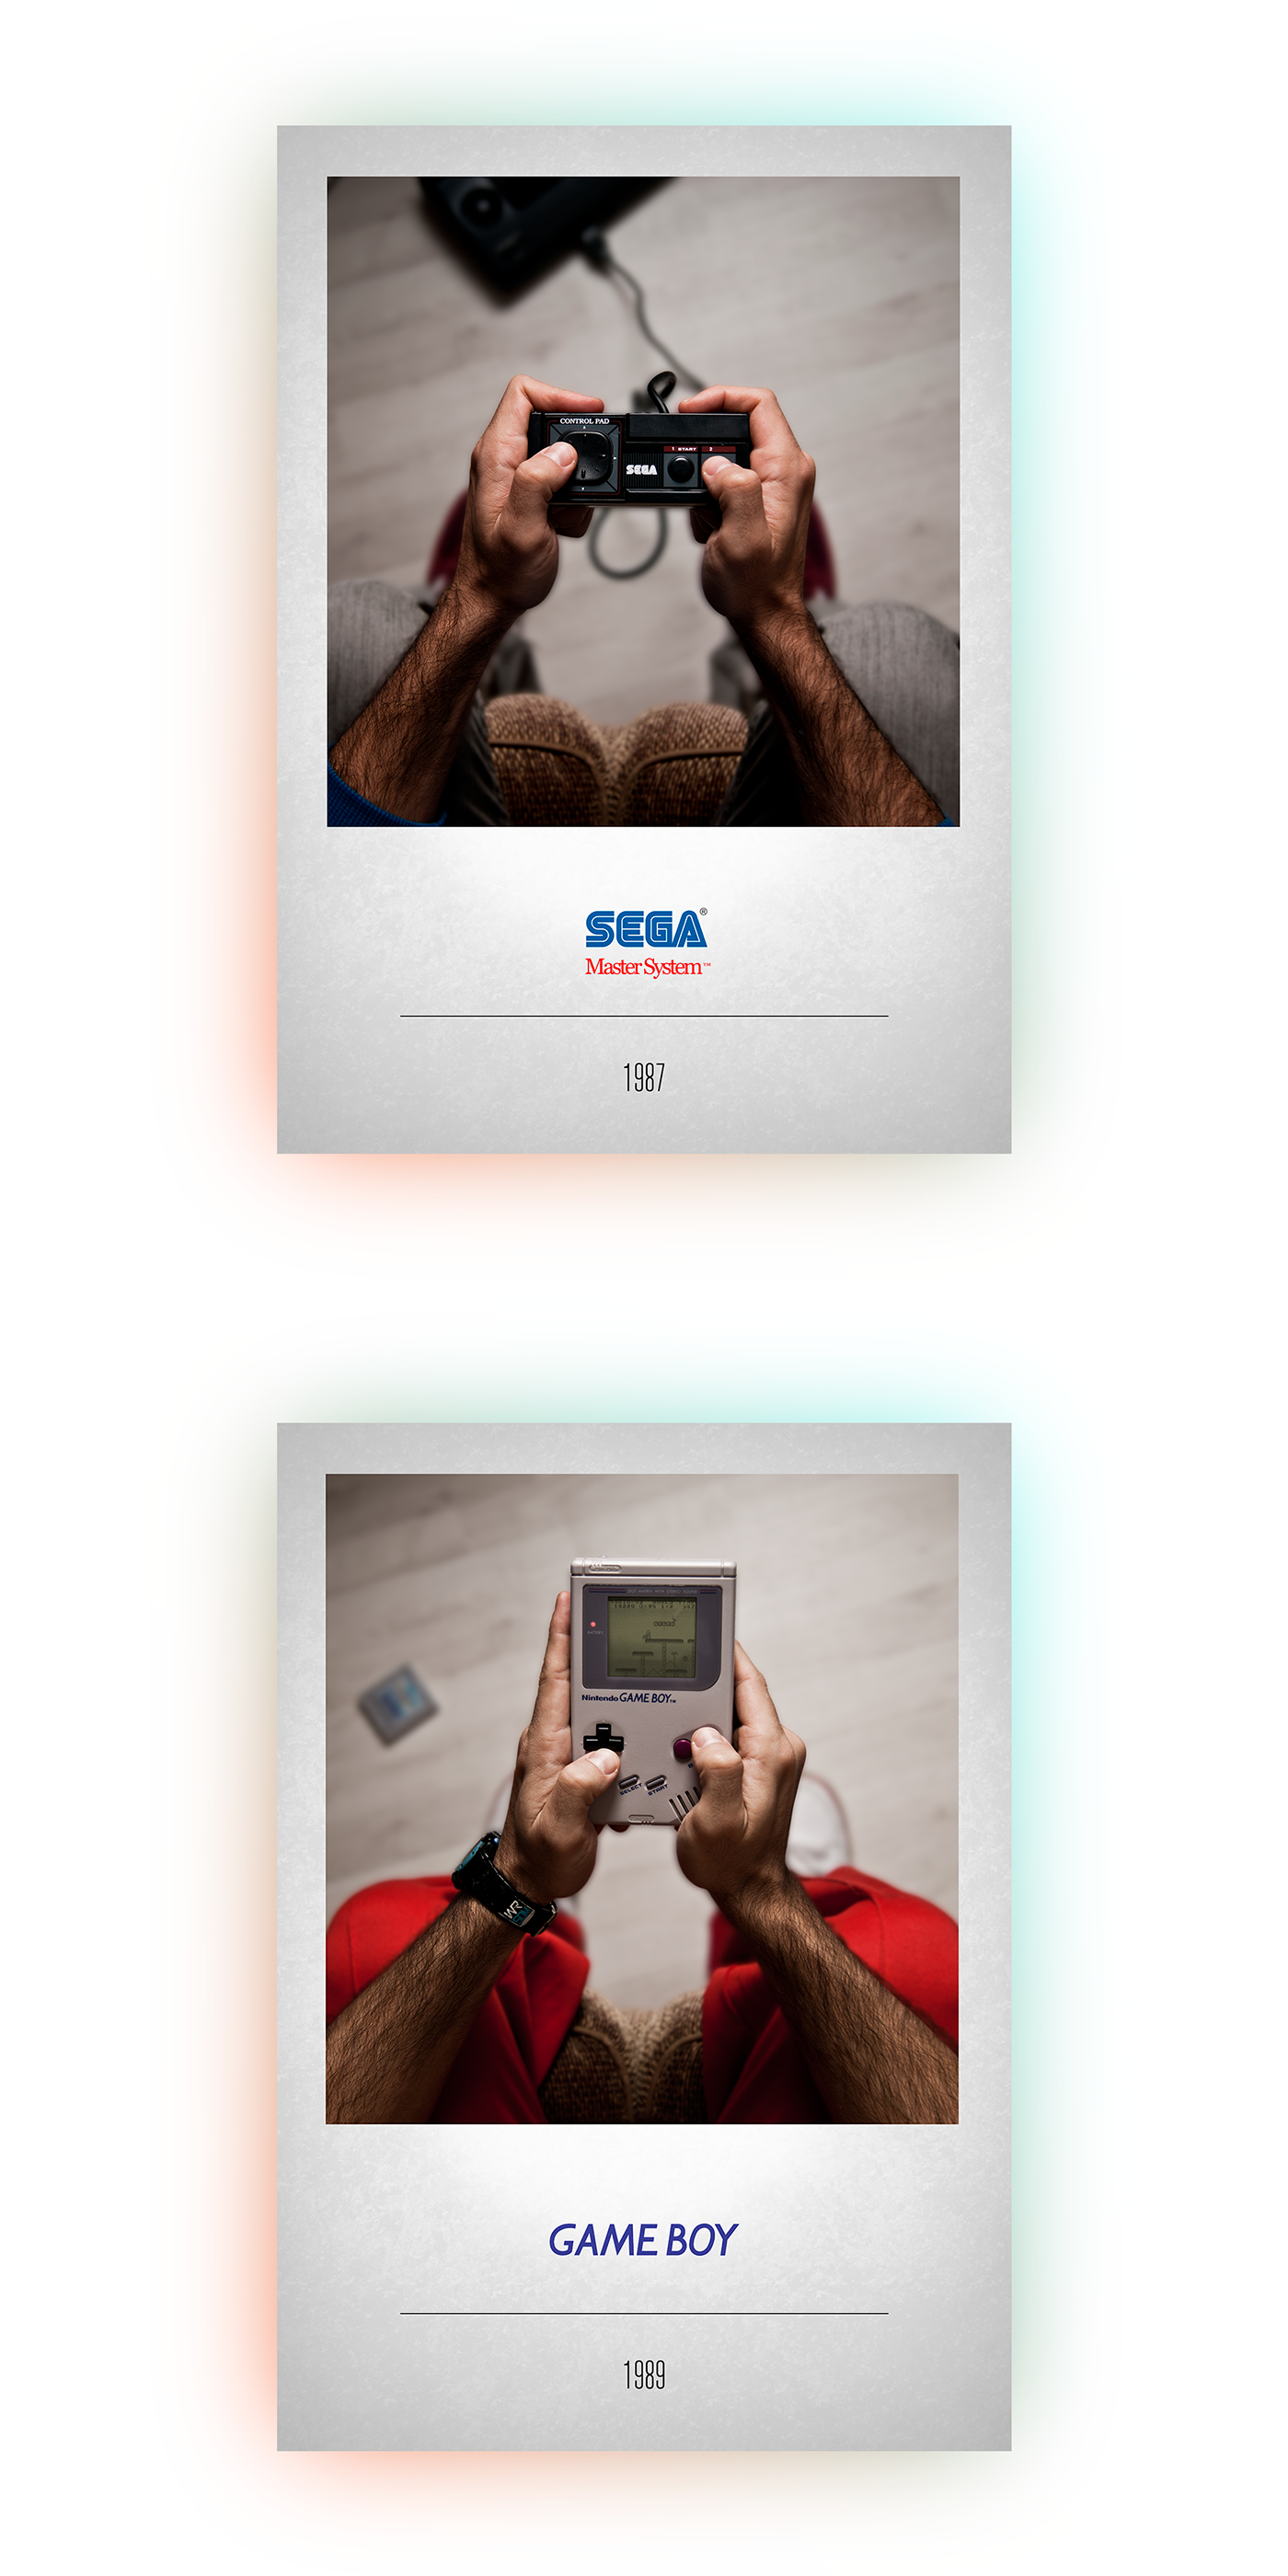 Videogames Games consoles controllers Nintendo atari SEGA xbox playstation poster gameboy gamegear Casio